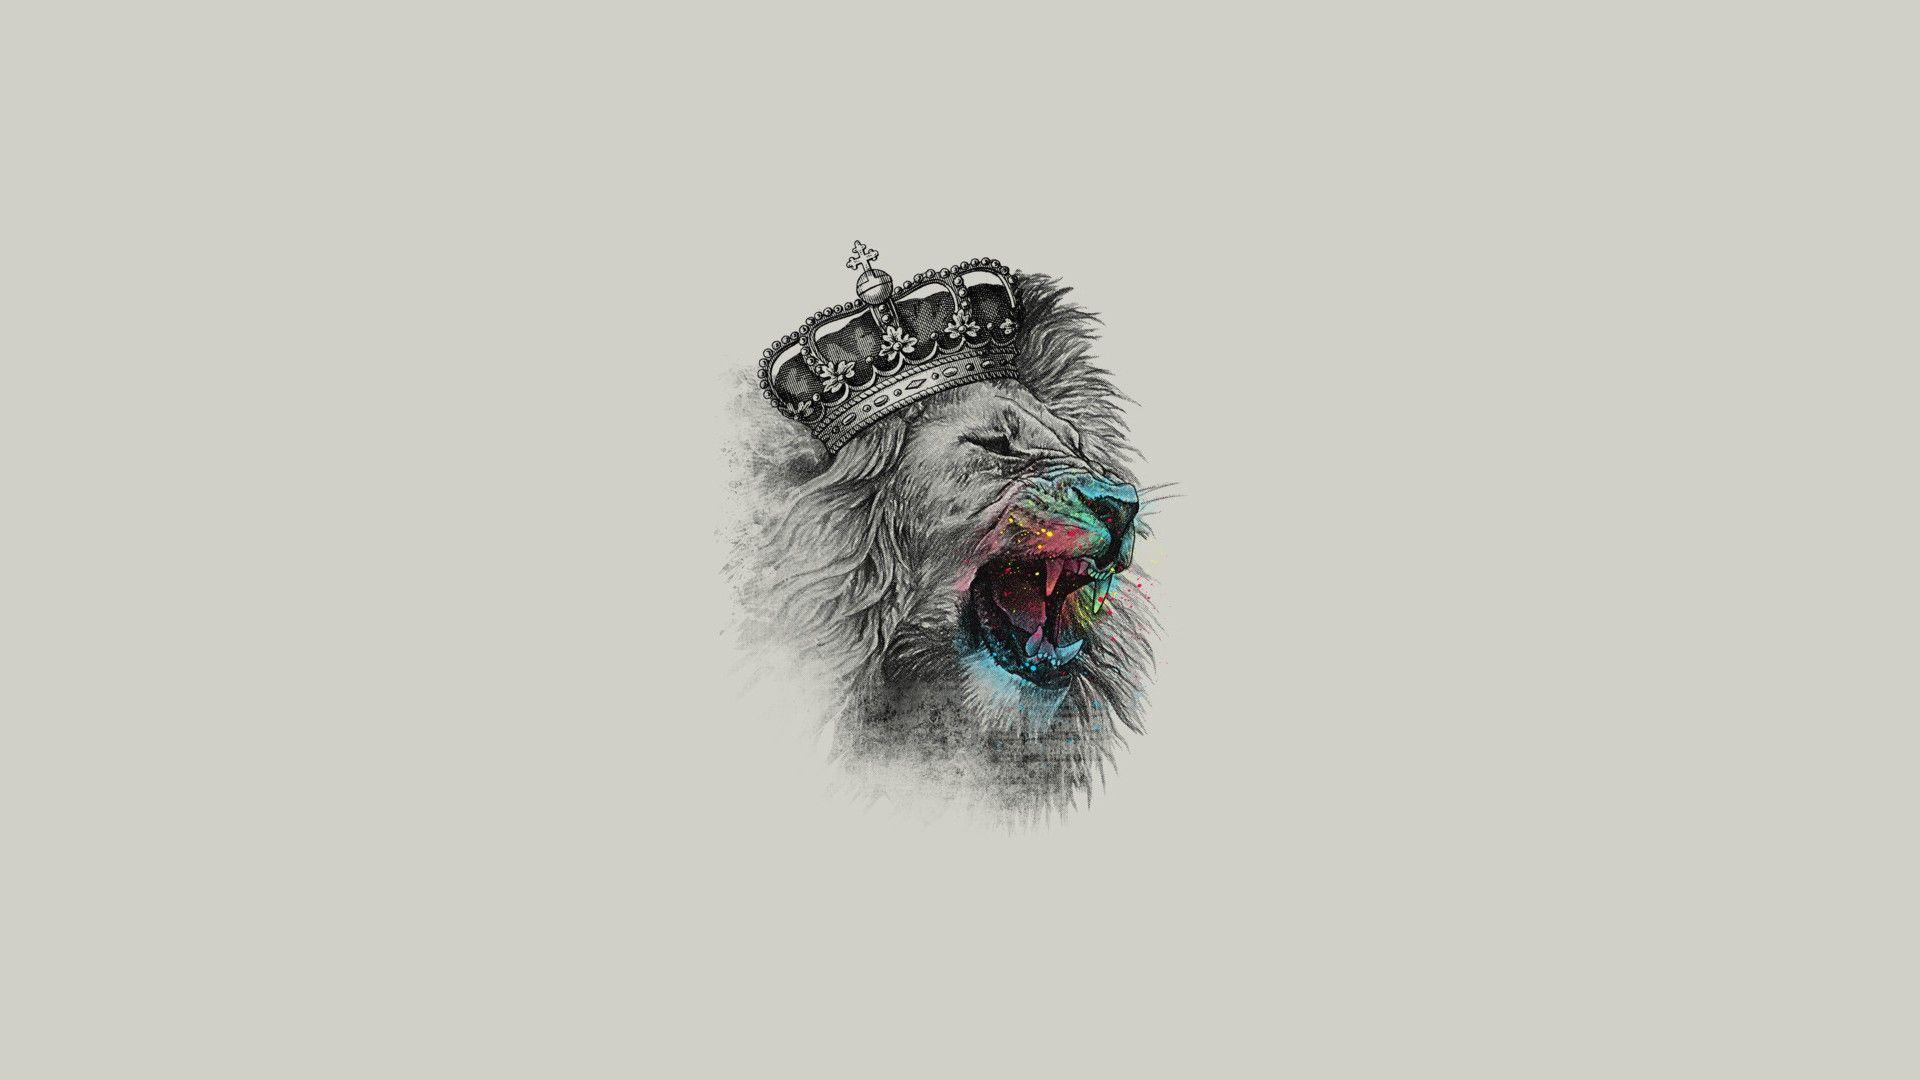 King Of The Jungle 1920x1080 Lion Artwork Fantasy Art Lion Hd Wallpaper